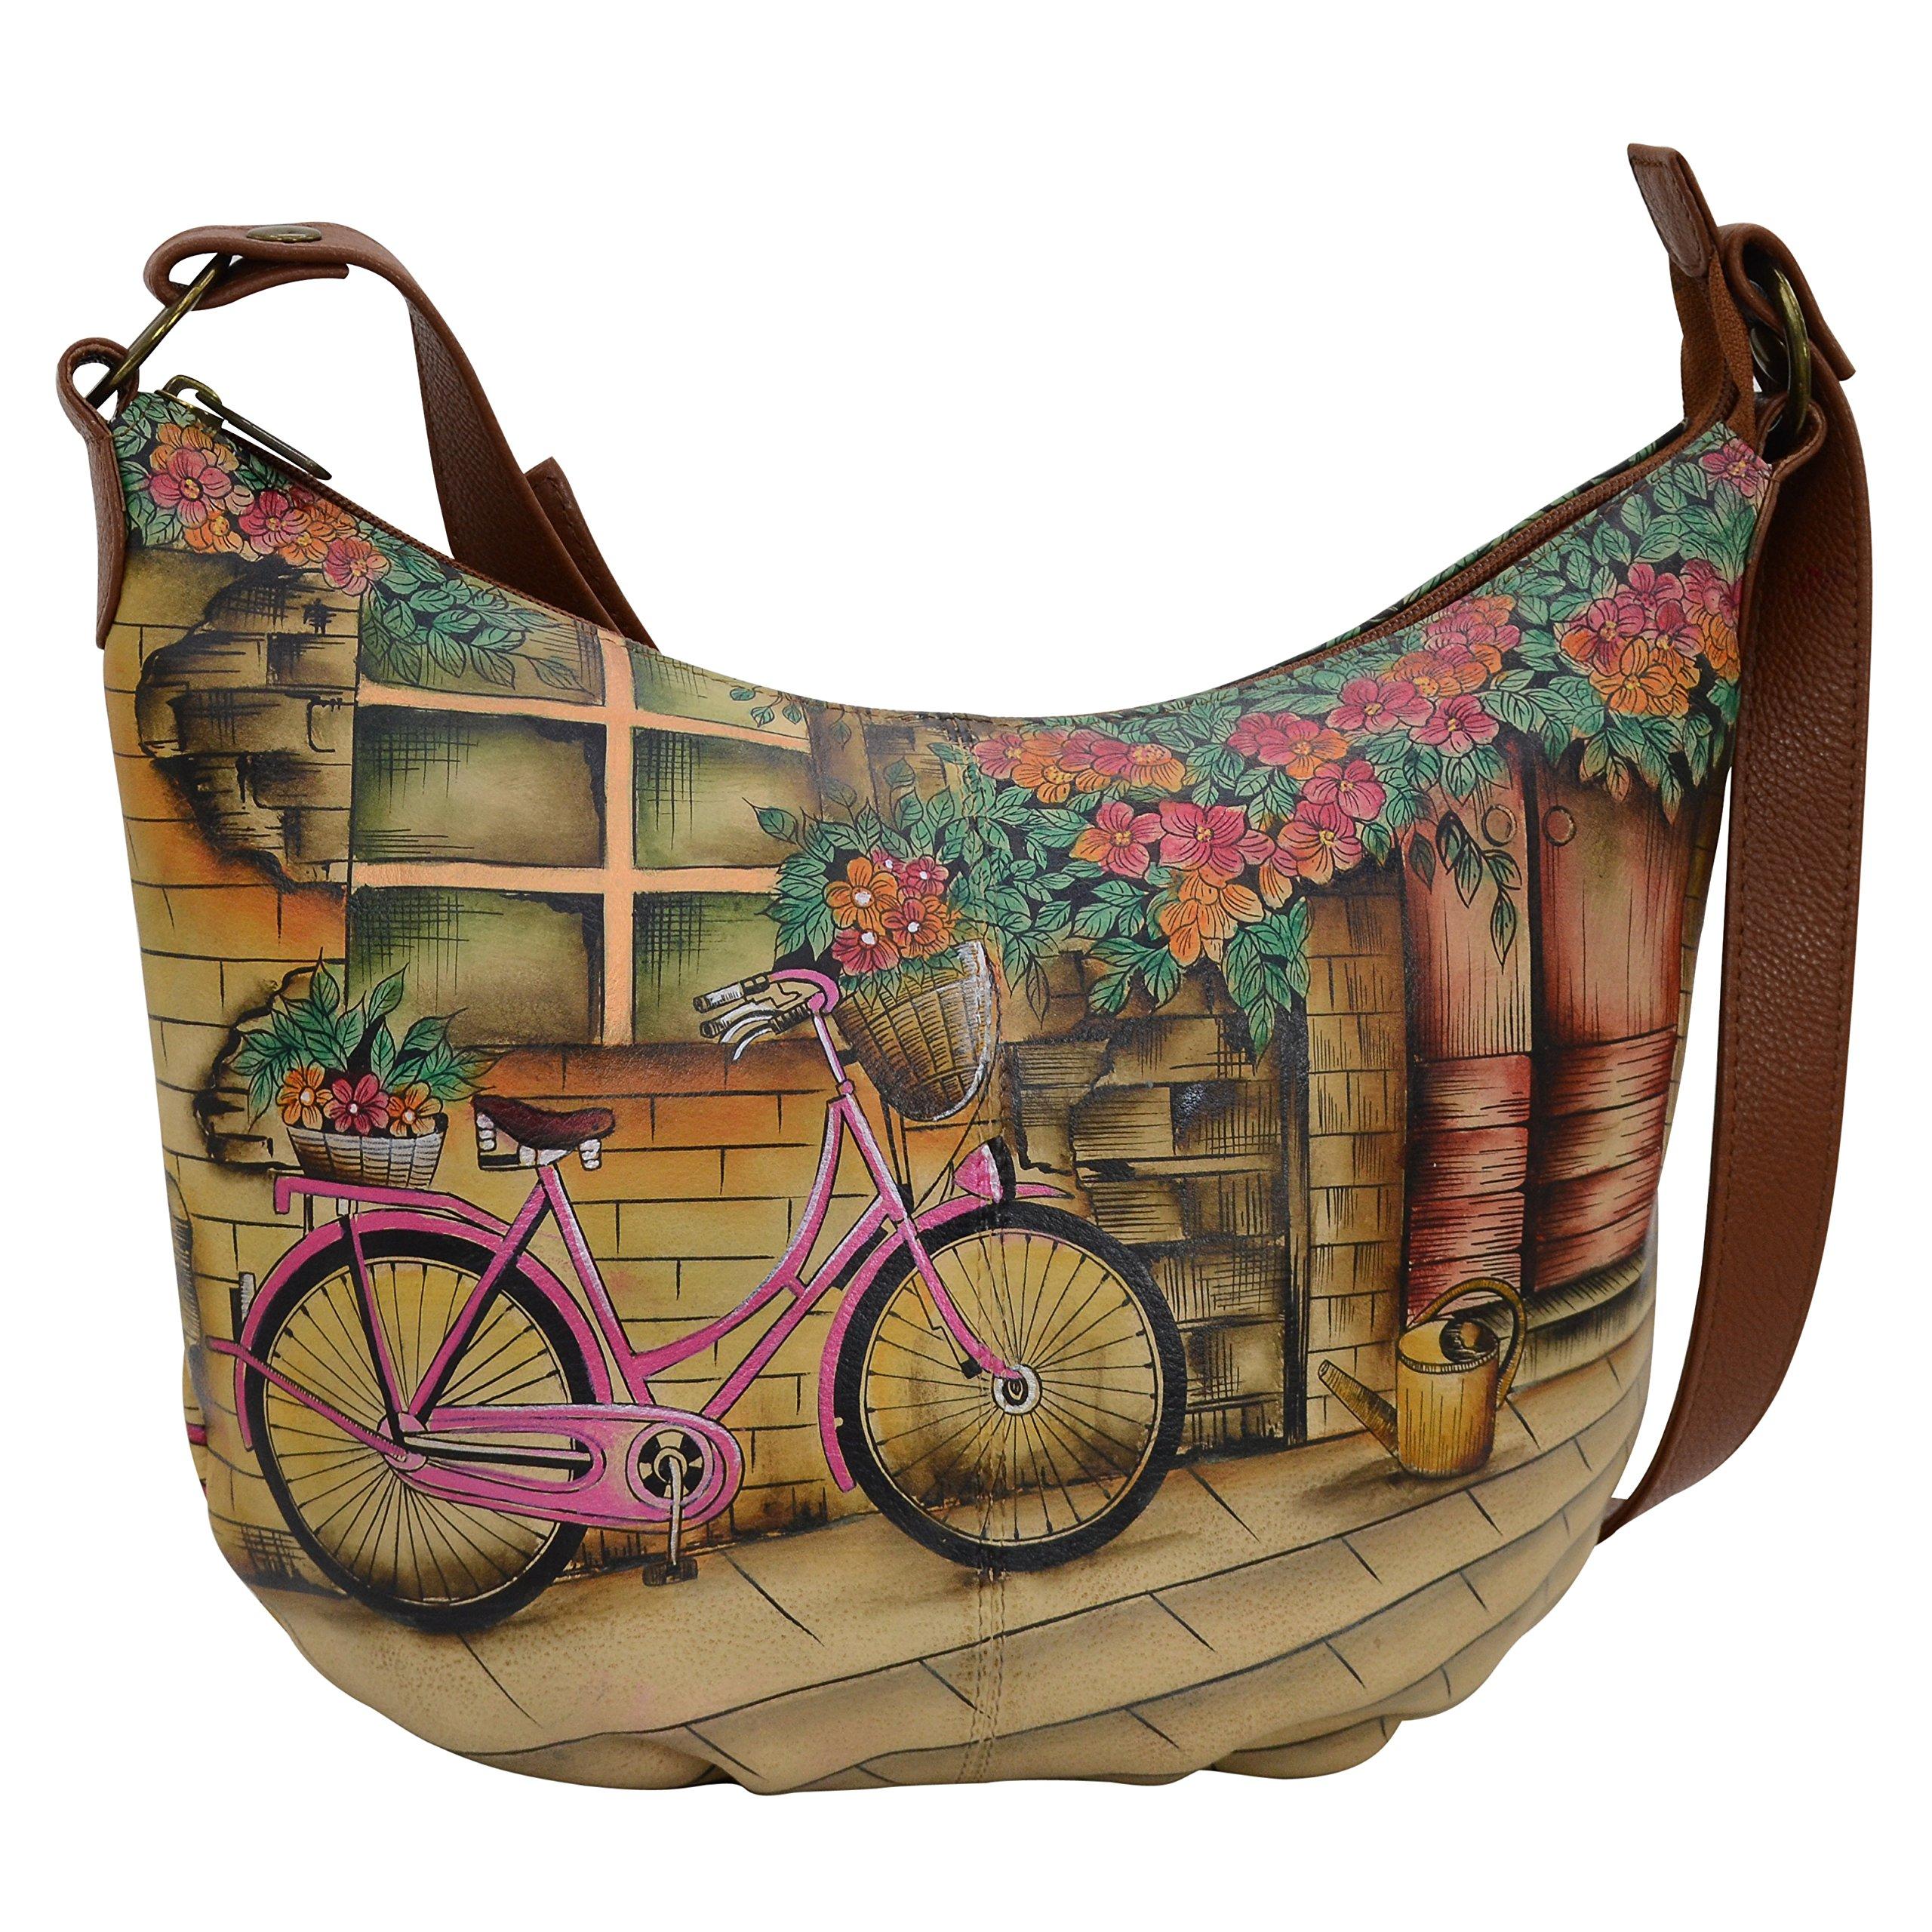 Anuschka Handbags Women's 471 Medium Bucket Hobo Vintage Bike Handbag by ANUSCHKA (Image #1)